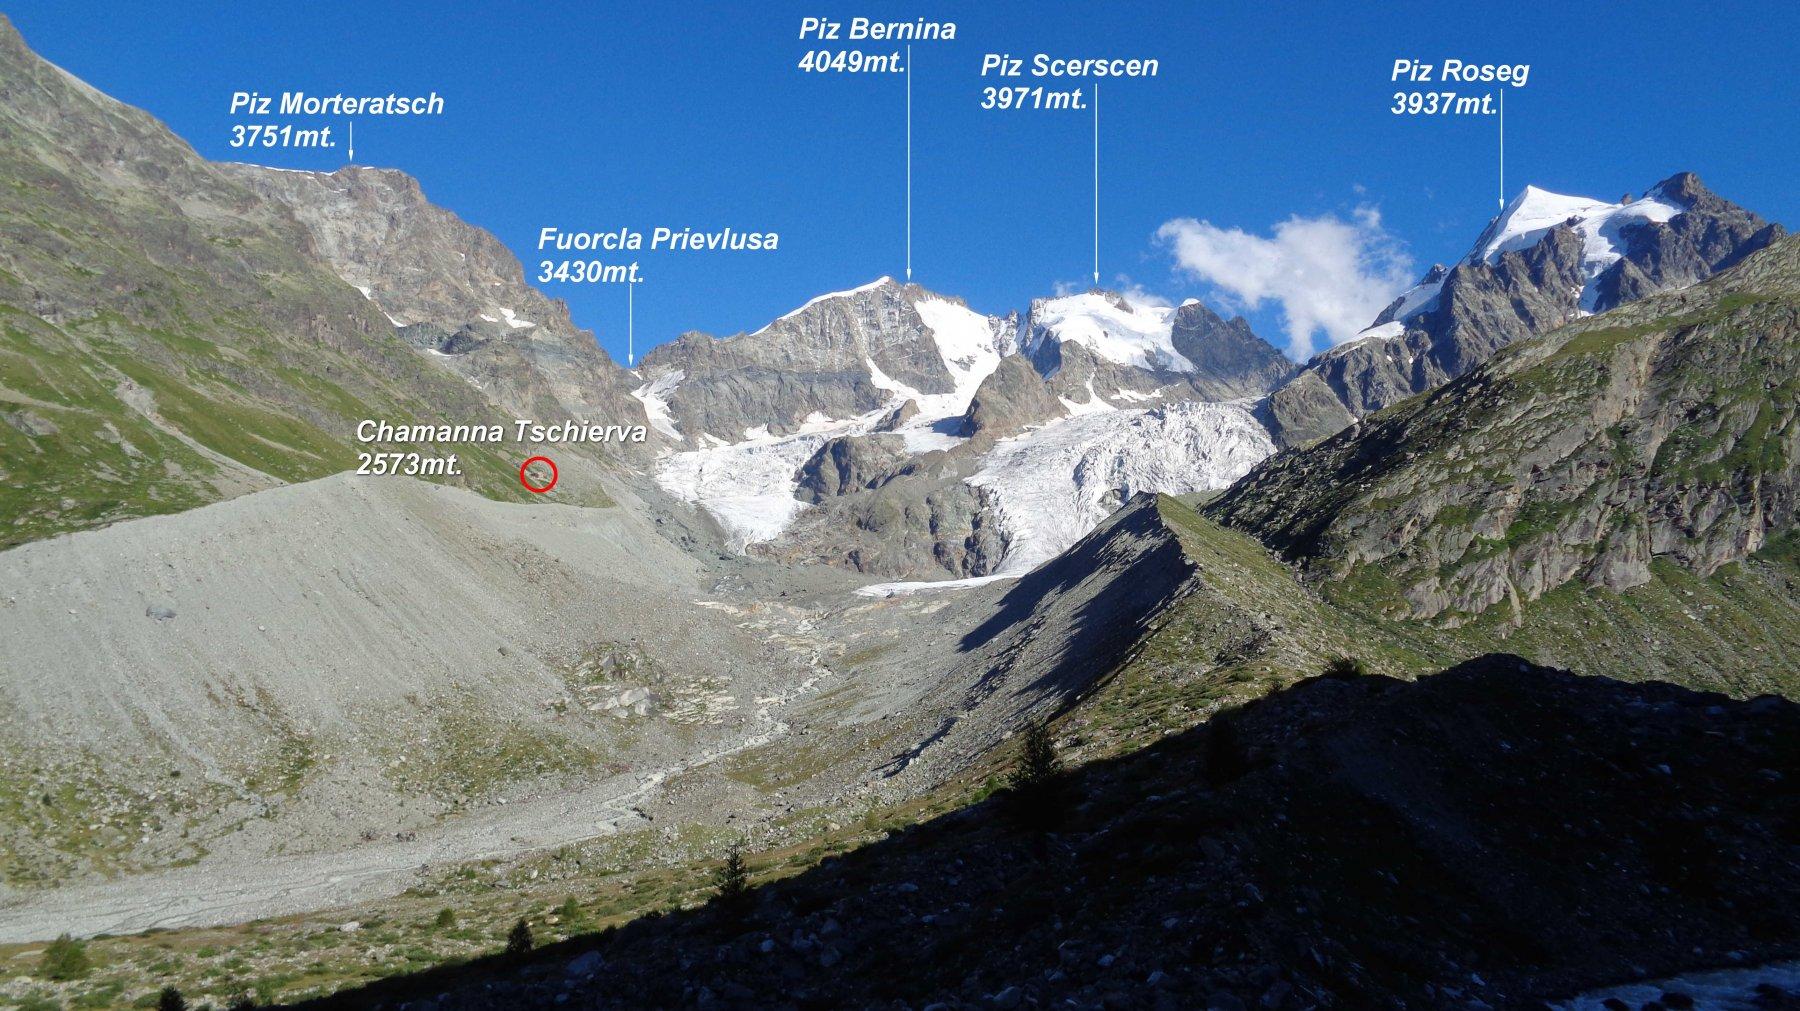 Si scende in Val Roseg con ottimo panorama sul Piz Bernina.